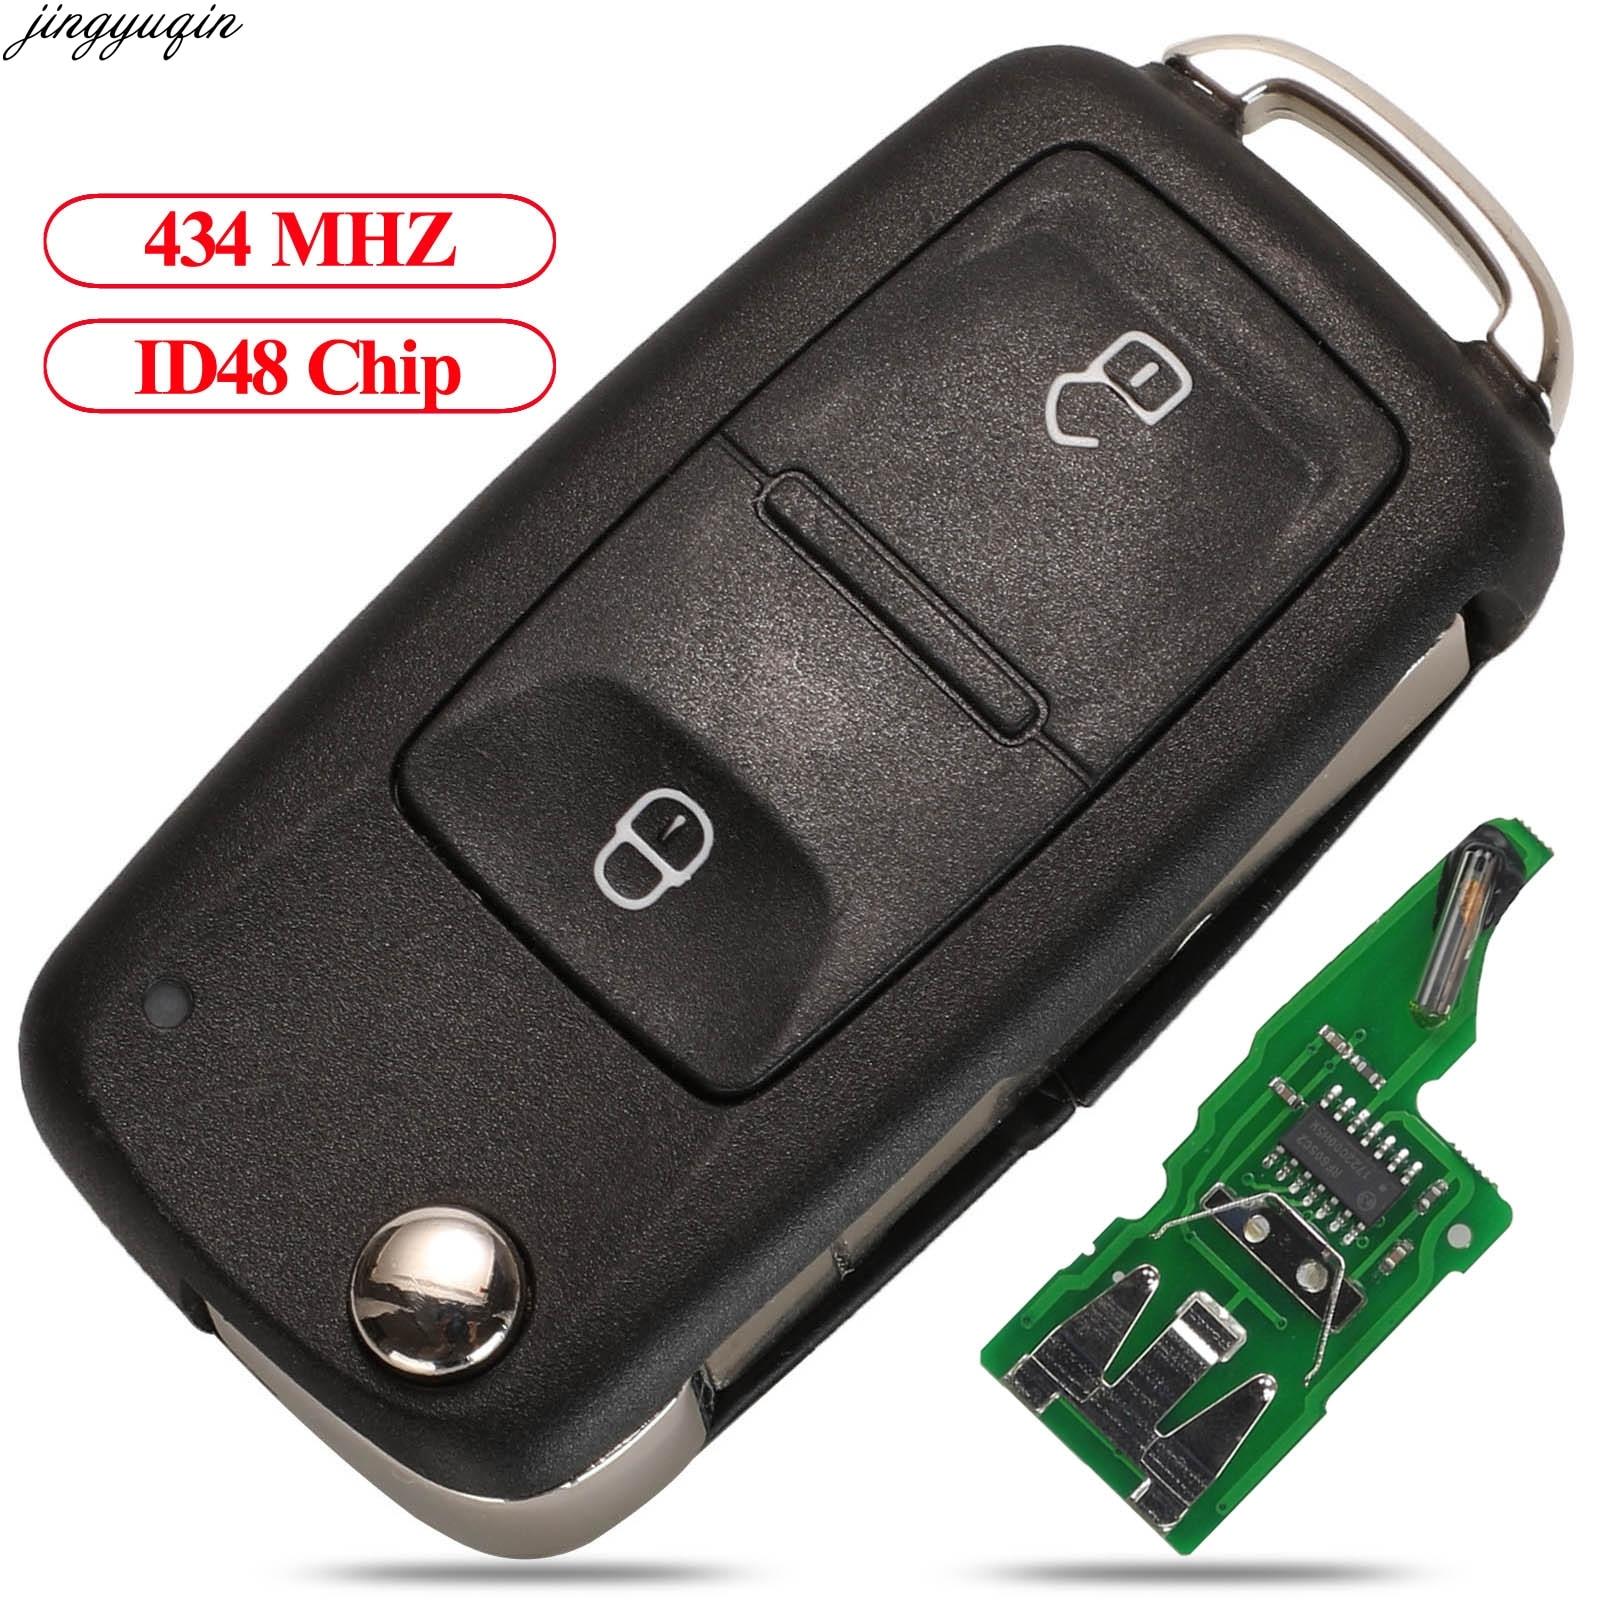 Jingyuqin Remote Car Flip Key 434MHz ID48 Chip For VOLKSWAGEN VW Amarok Transporter 2011-2016 7E0837202AD 5K0837202AD 2 Buttons